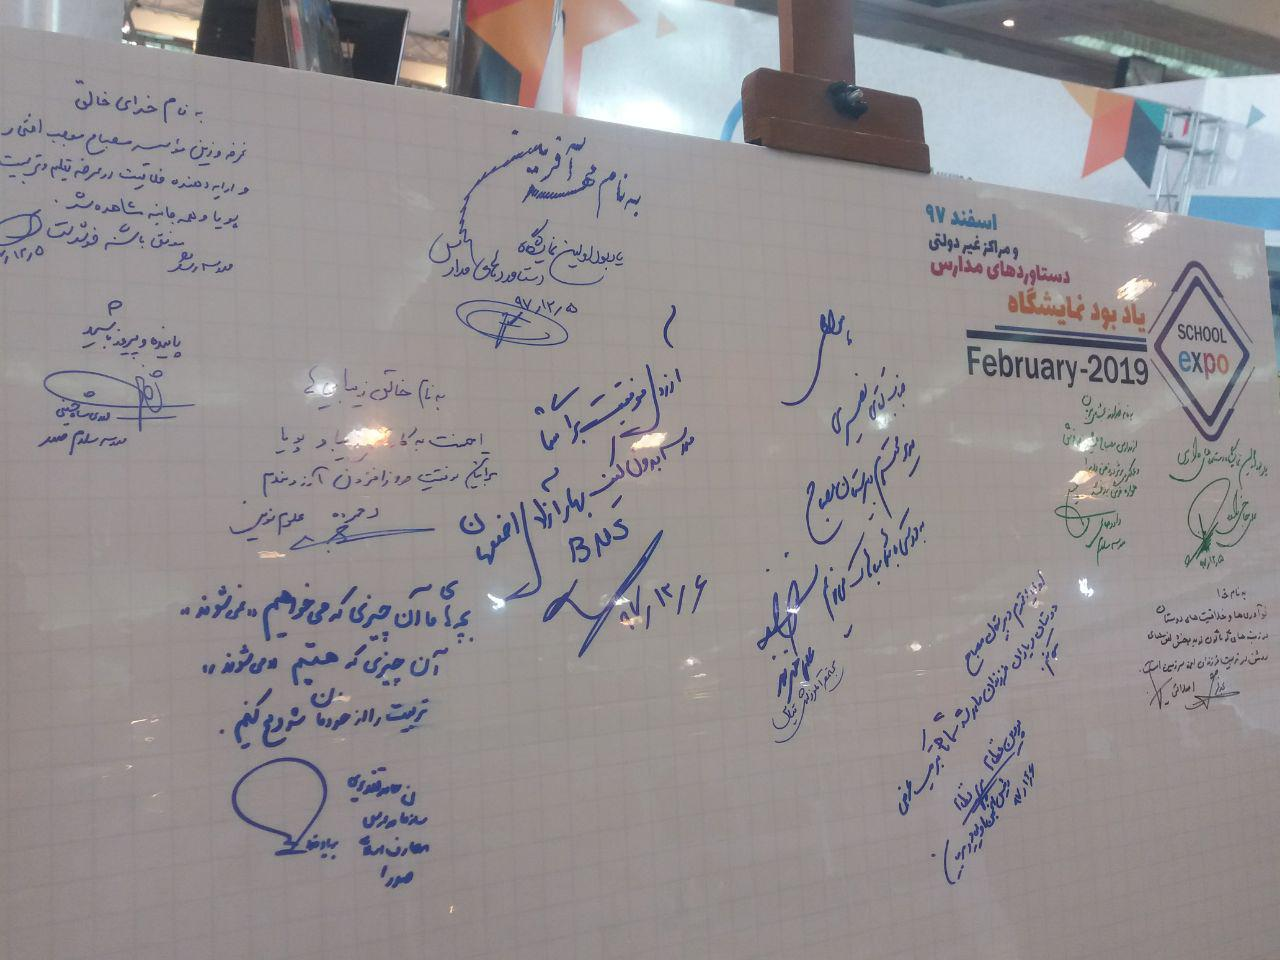 photo 2019 03 01 22 35 18 - نخستین نمایشگاه دستاوردهای مدارس غیر دولتی در تهران